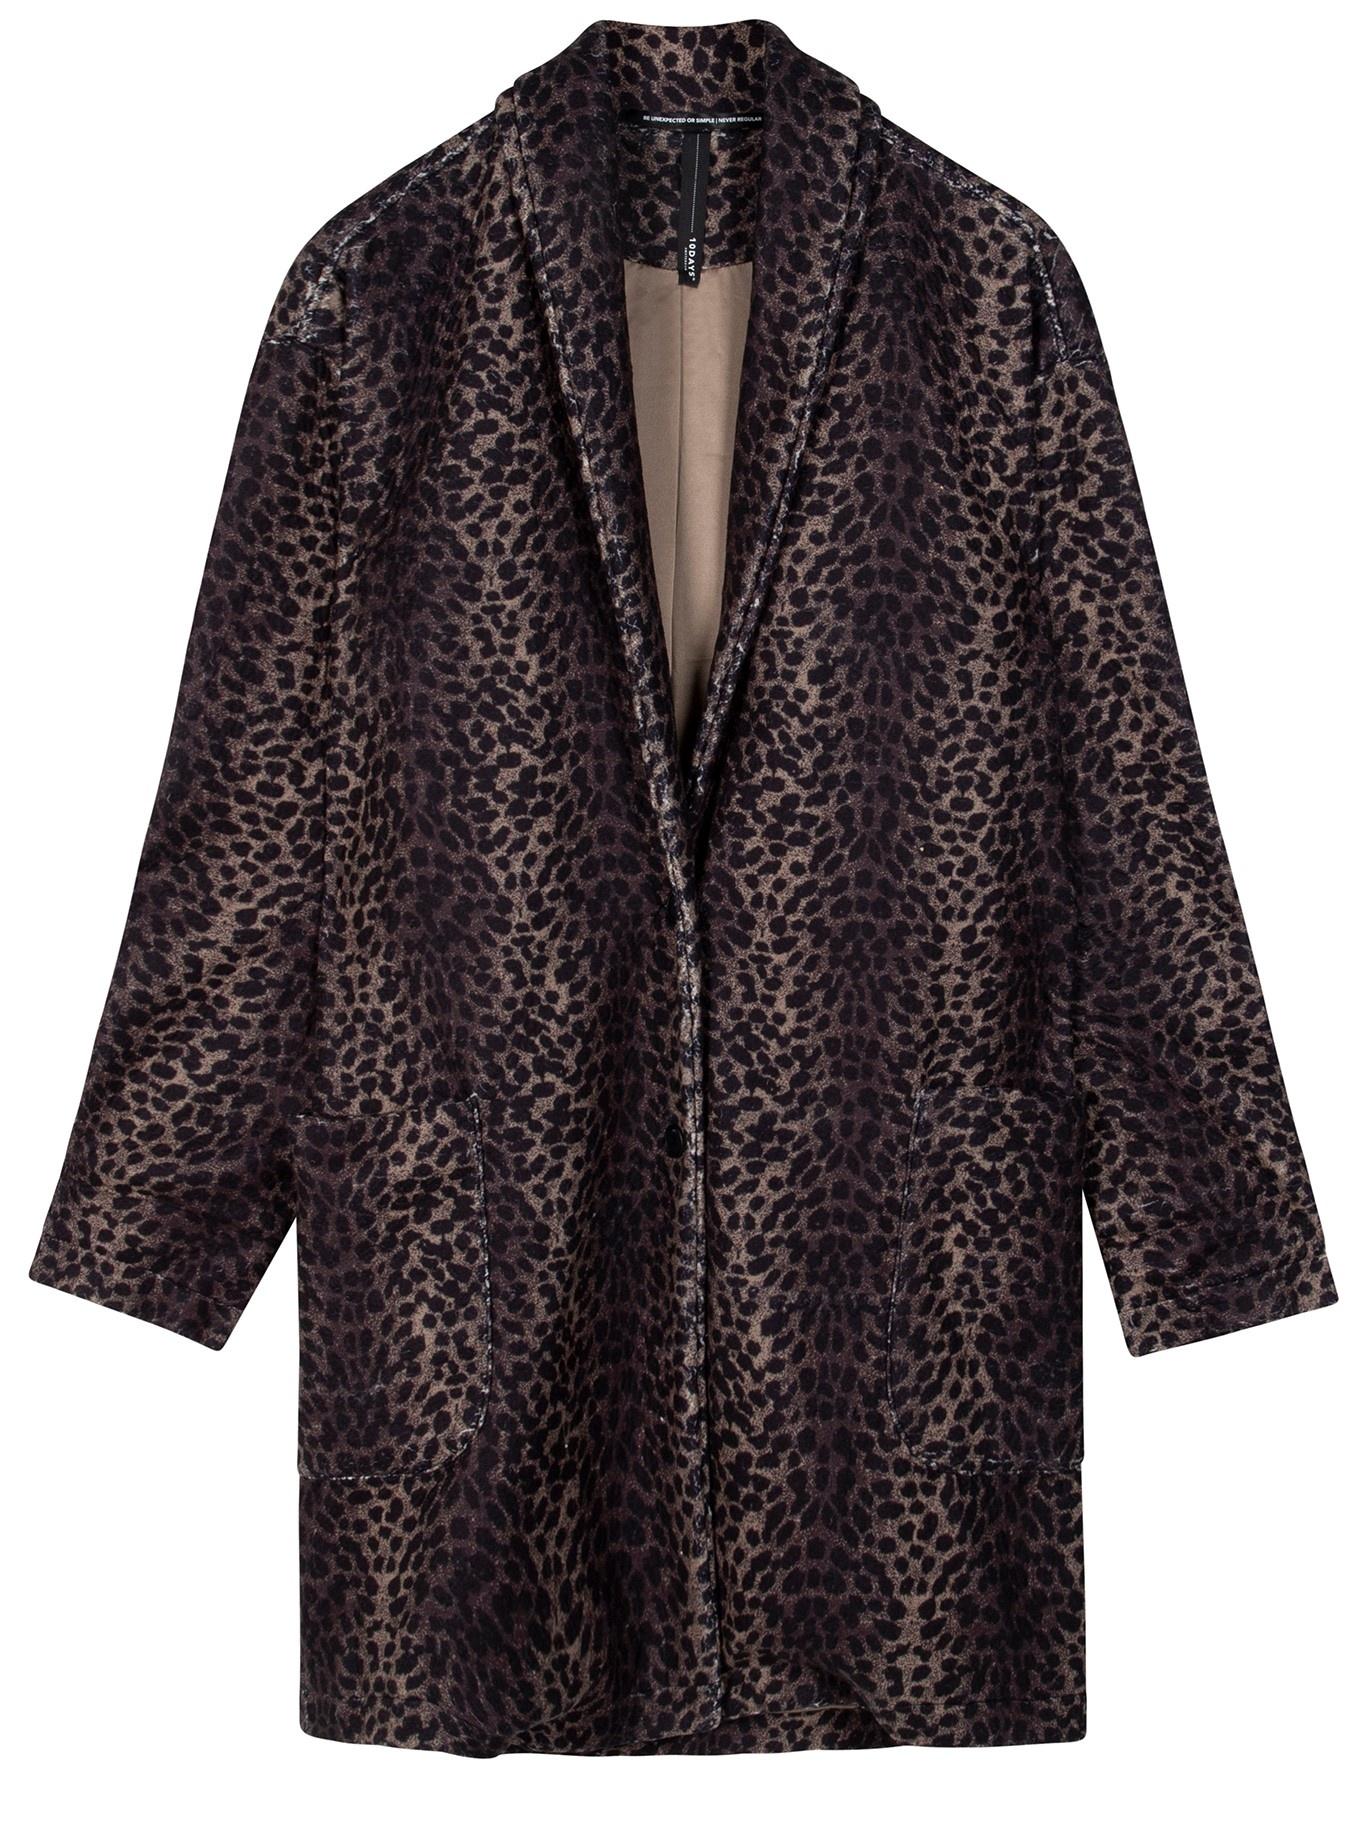 Jas coat leopard camo desert taupe-2